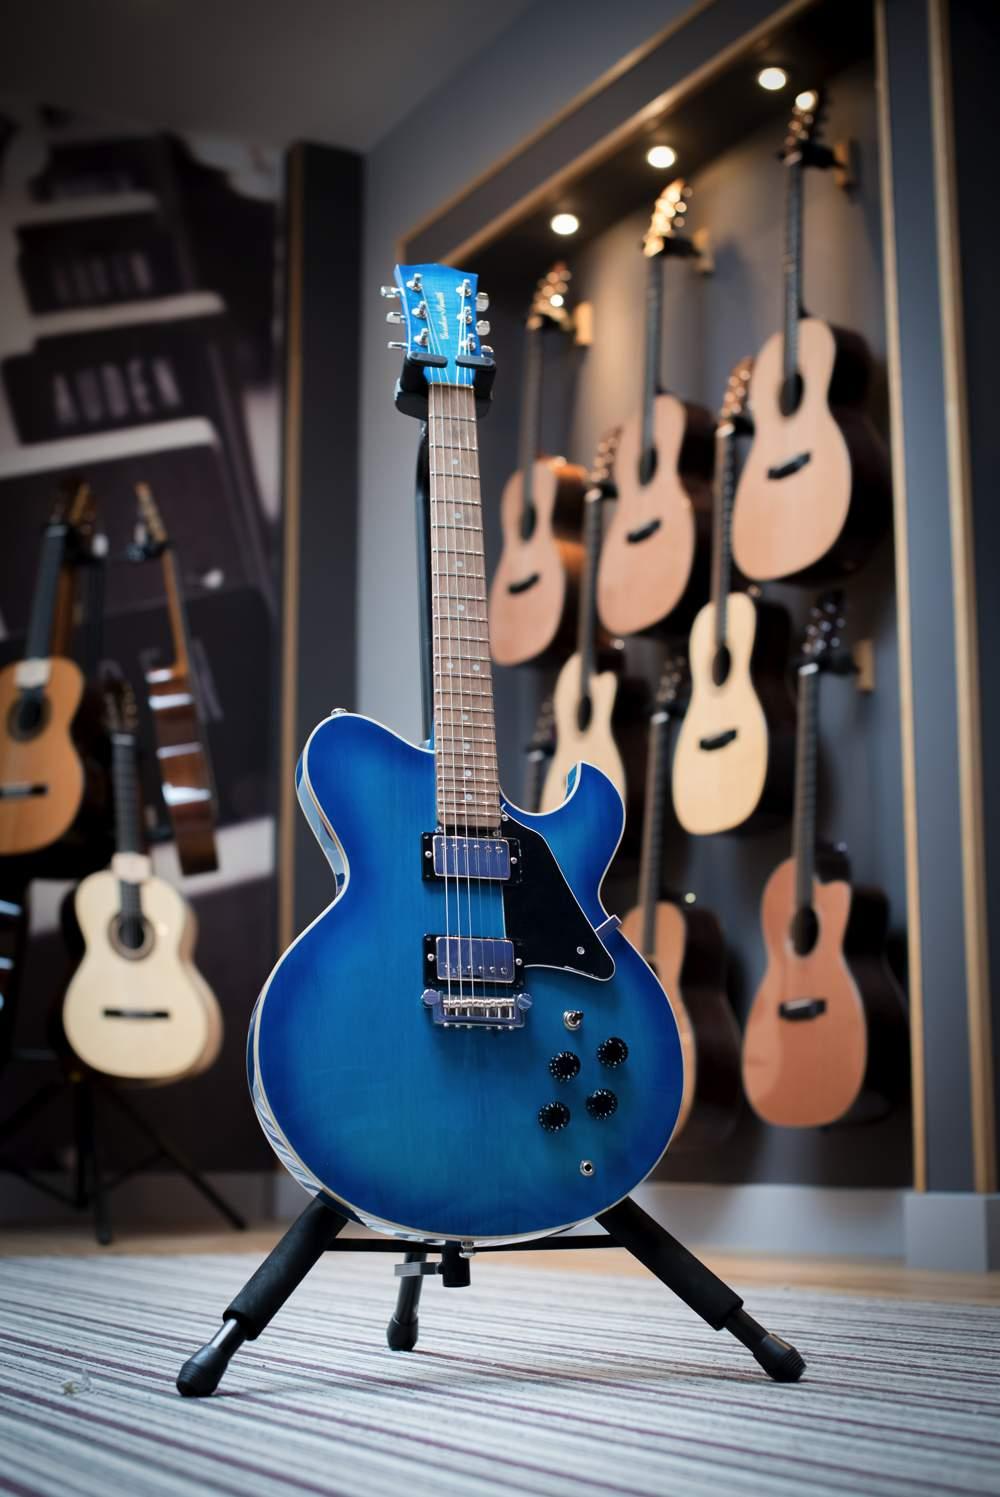 Gordon smith guitars dating service